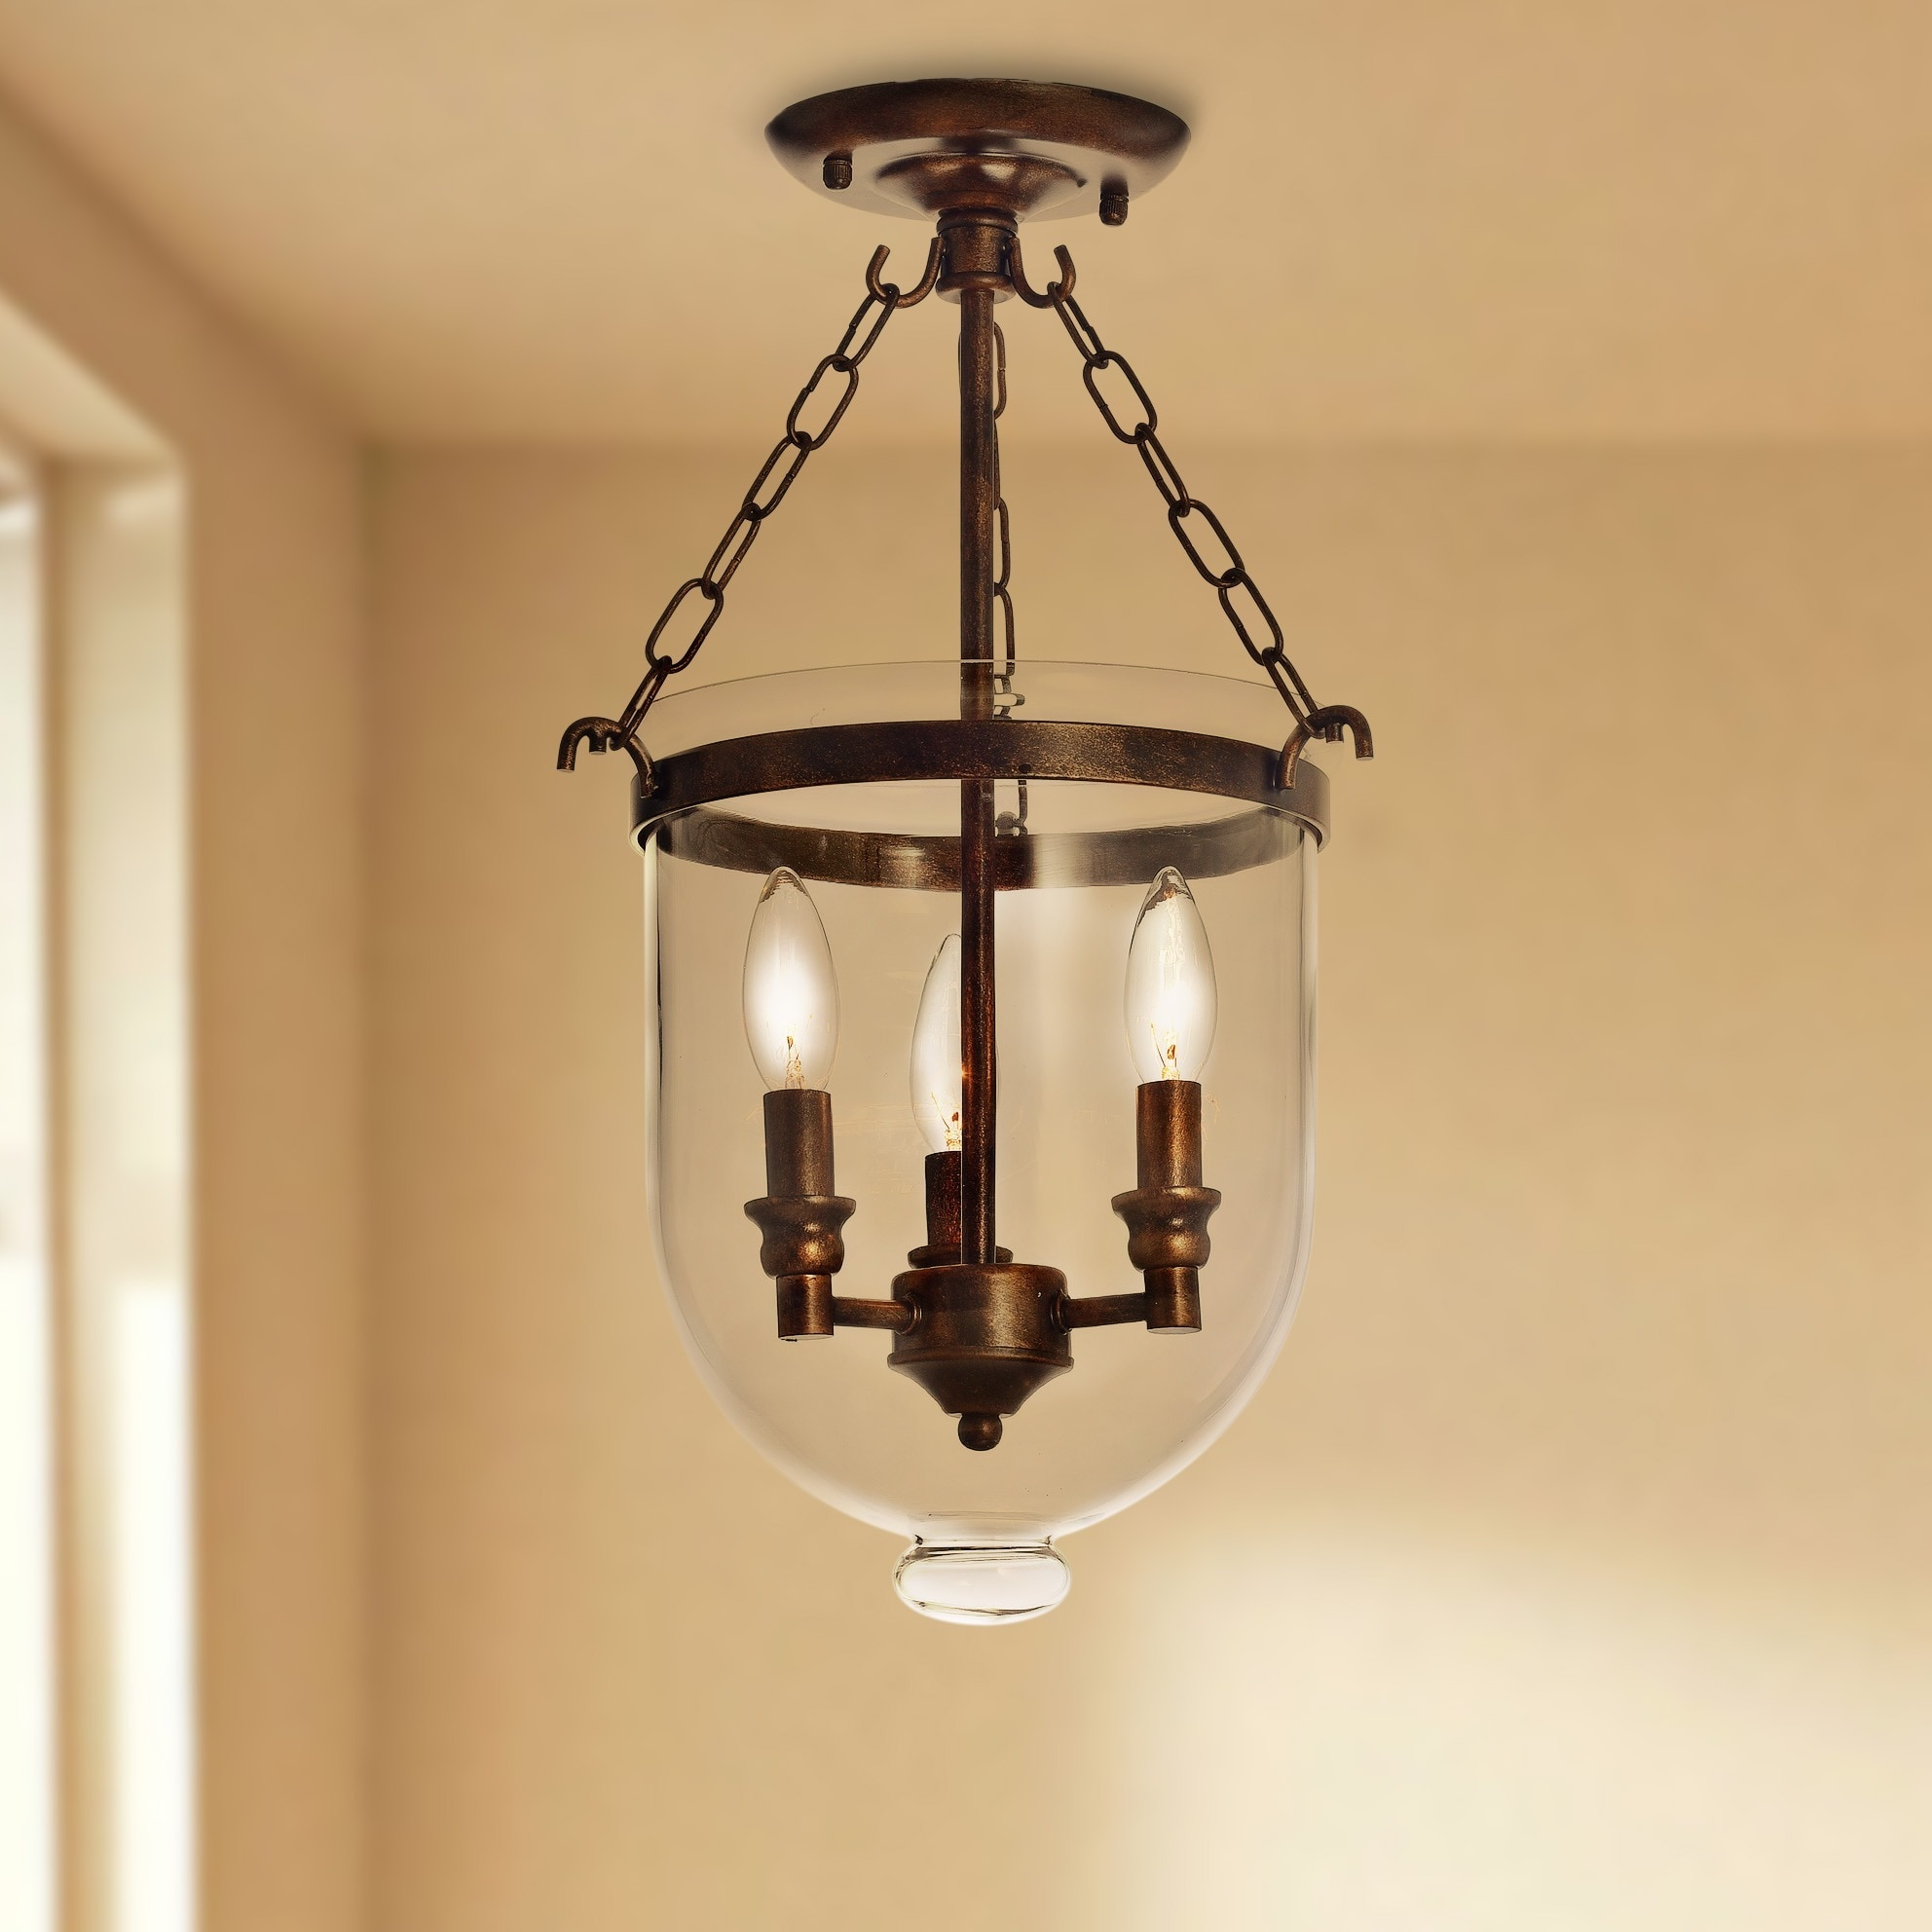 Buy Flush Mount Lighting Online at Overstock.com | Our Best Lighting ...